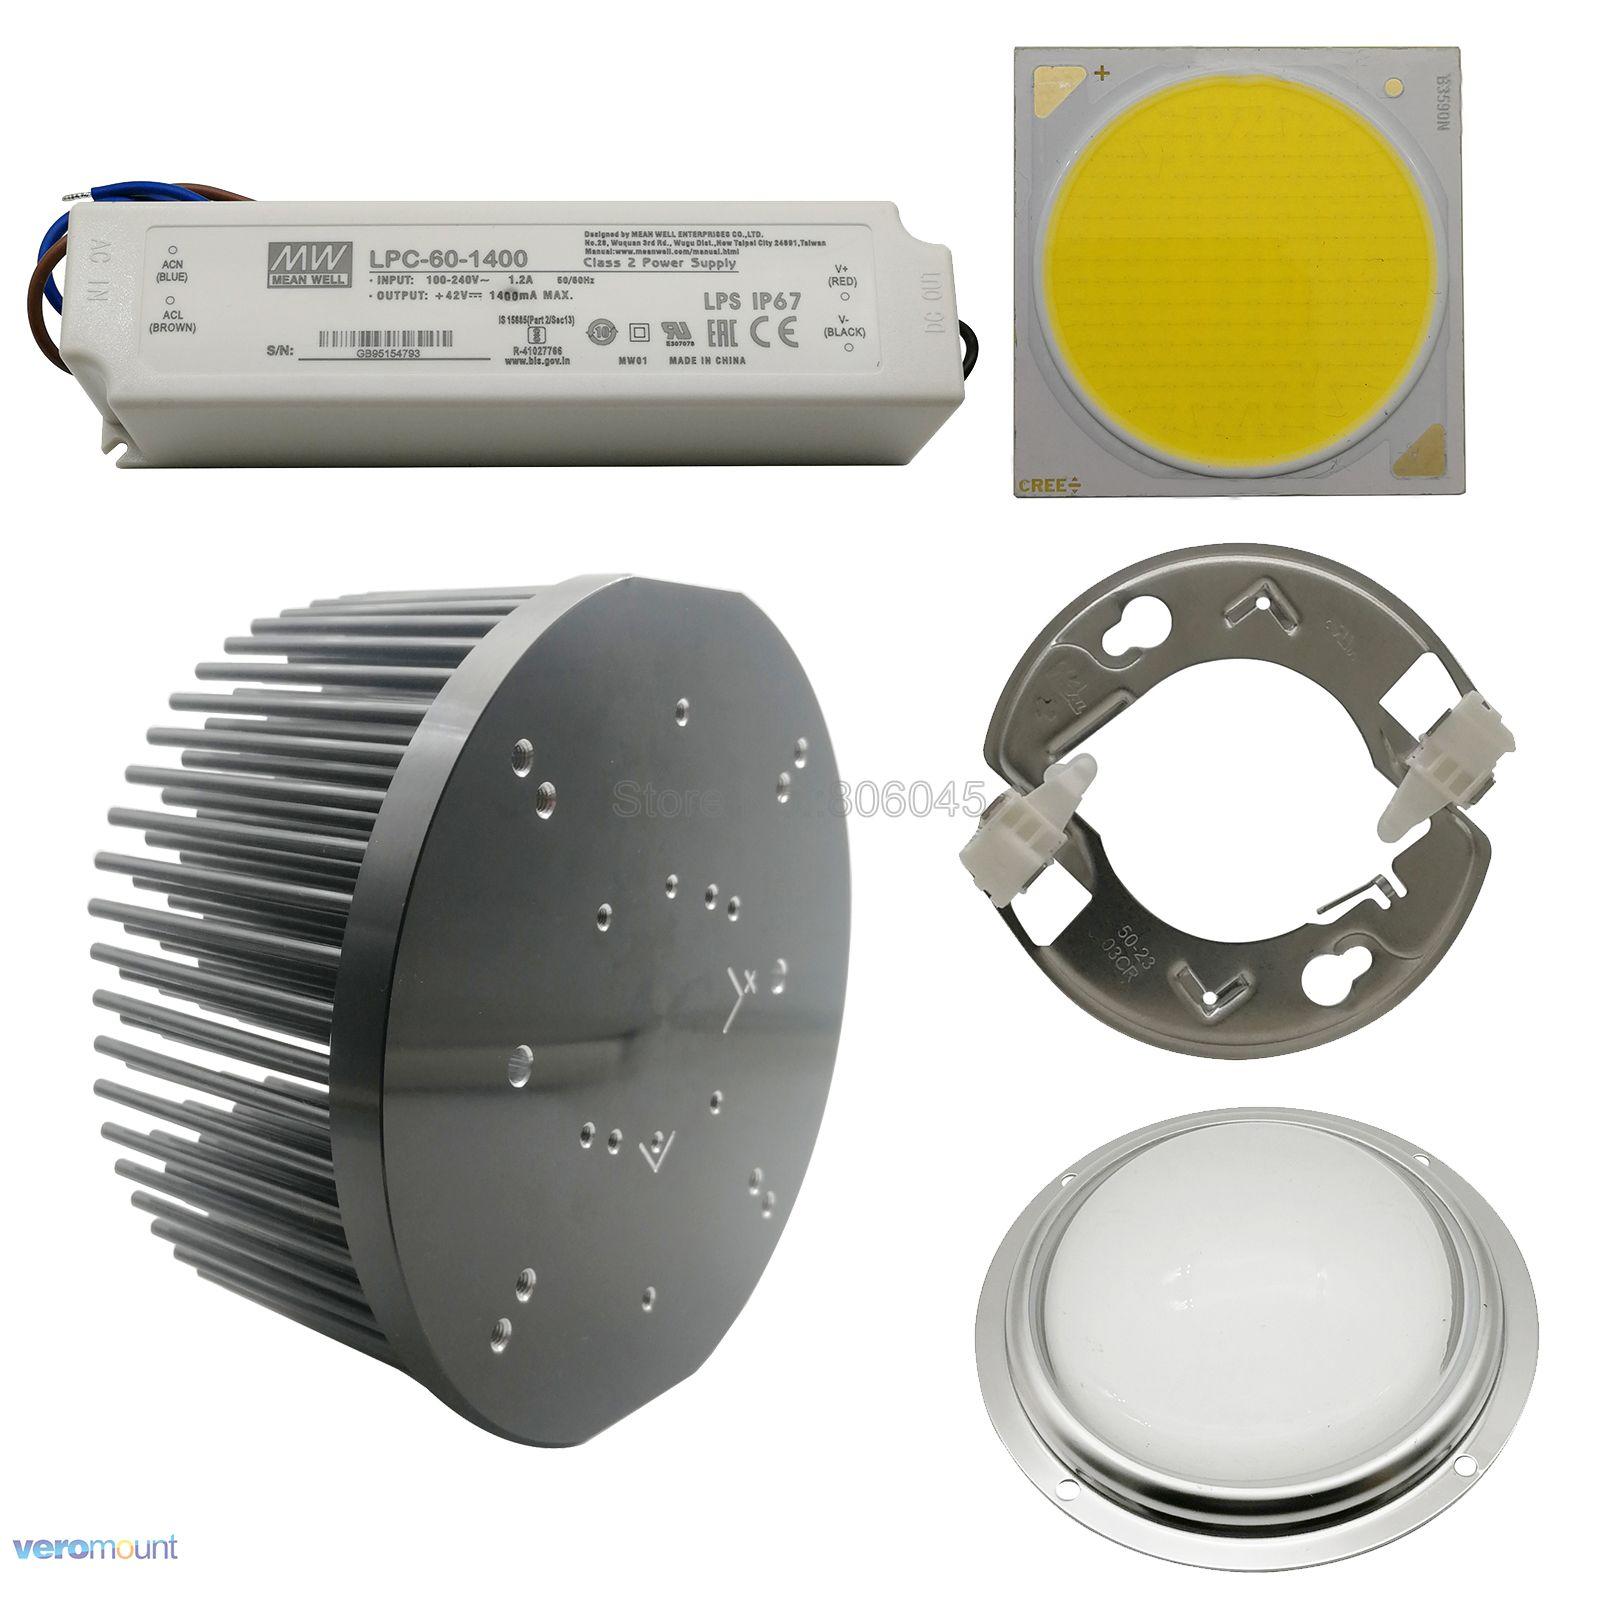 Cree cxb3590 cob led cresce a luz titular ideal 50-2303cr 133mm dissipador de calor meanwell motorista LPC-60-1400 100mm lente de vidro diy conjunto completo